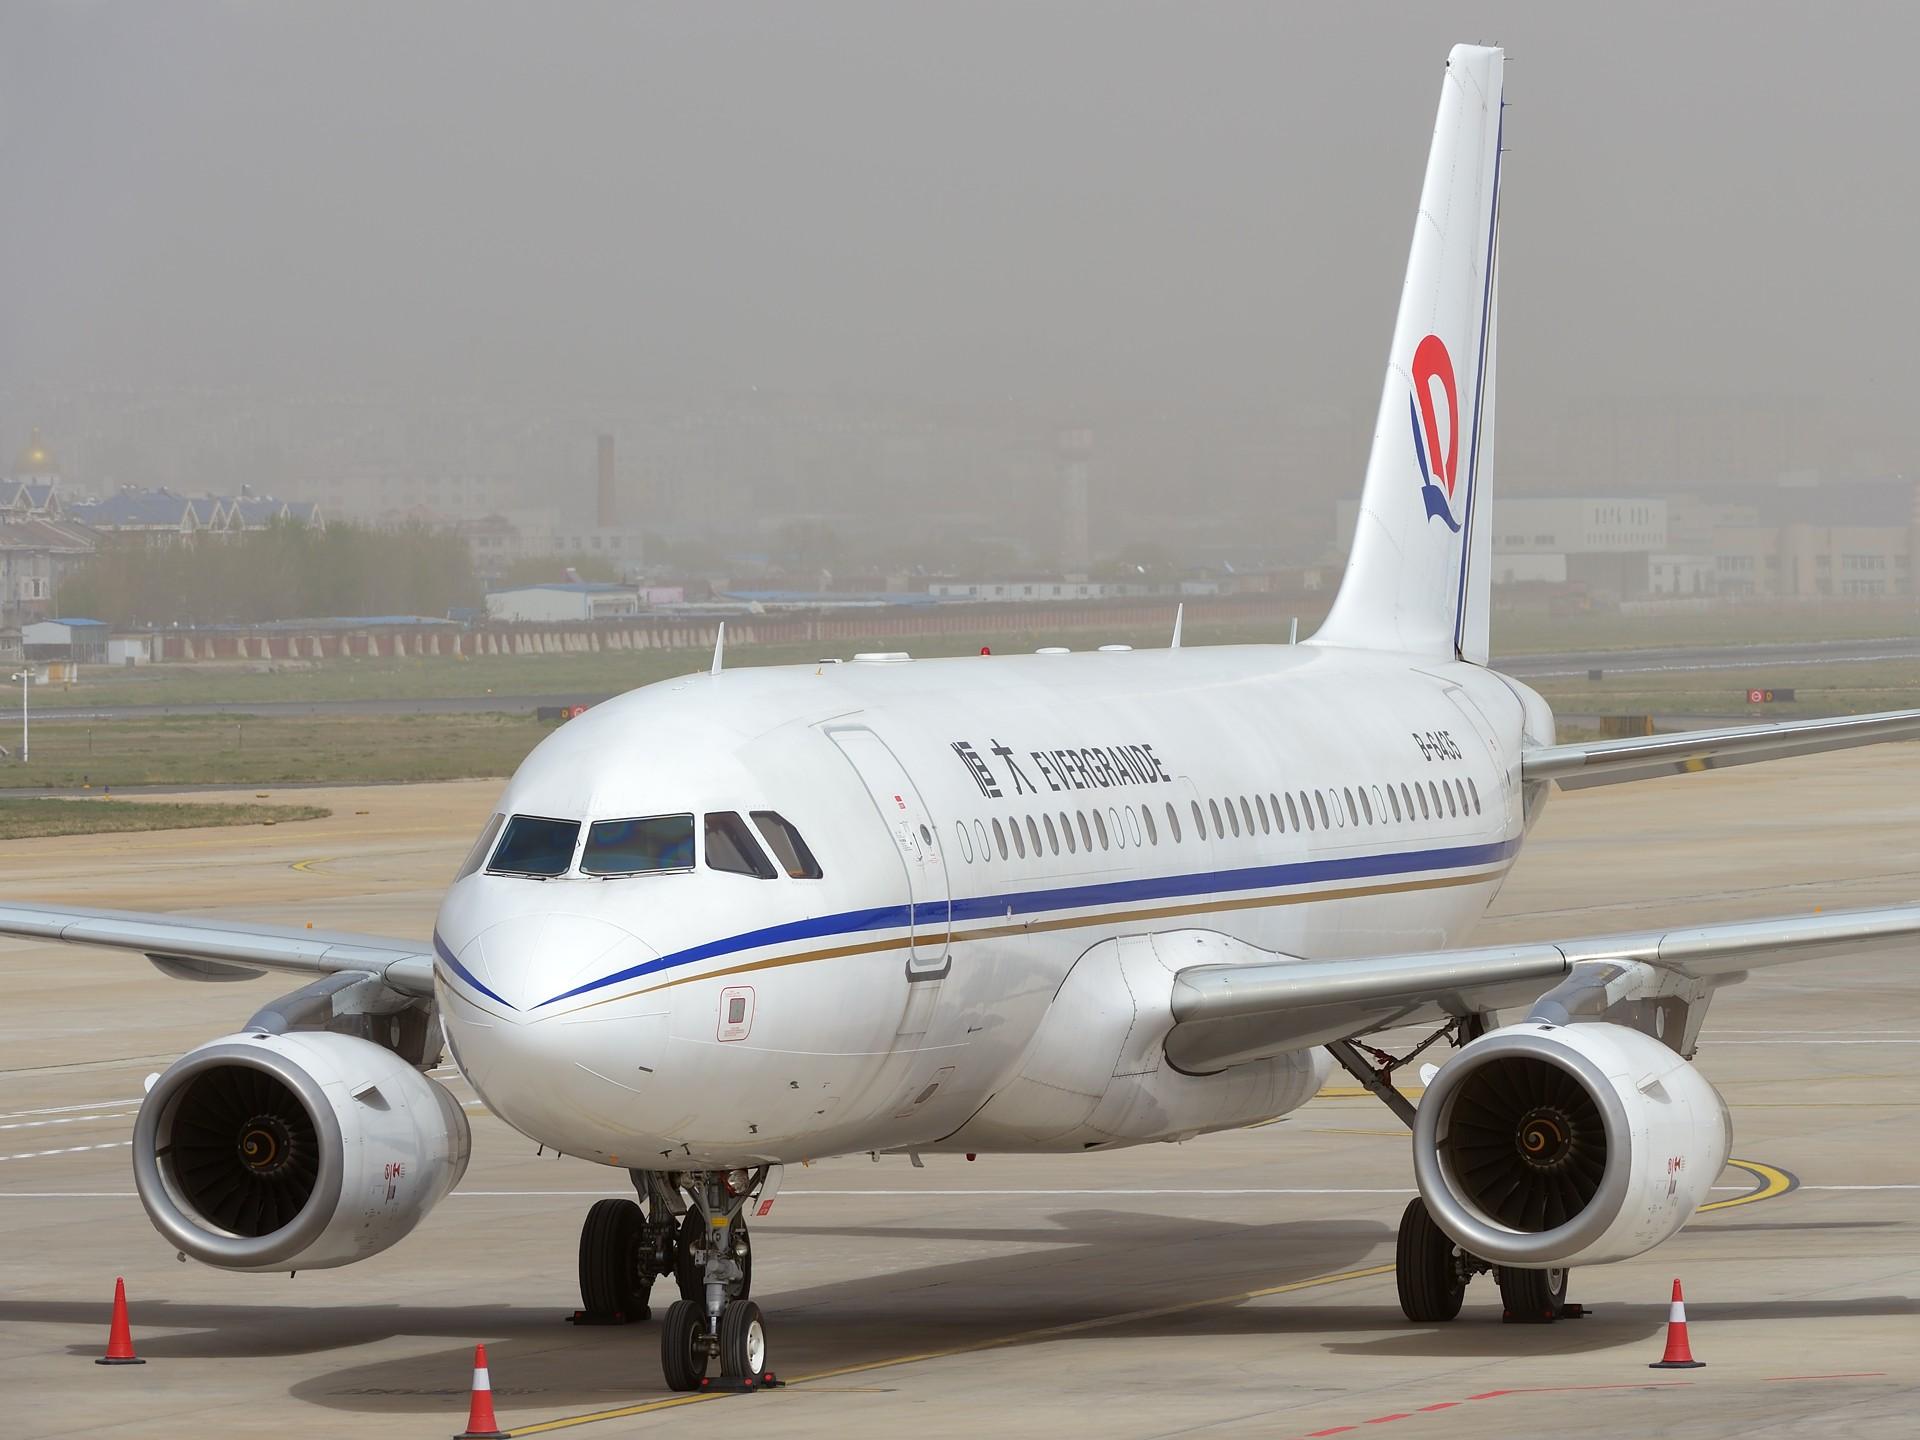 Re:[原创]★[DLC]2016年终总结(持续更新中)★ AIRBUS A319-133CJ B-6435 中国大连国际机场